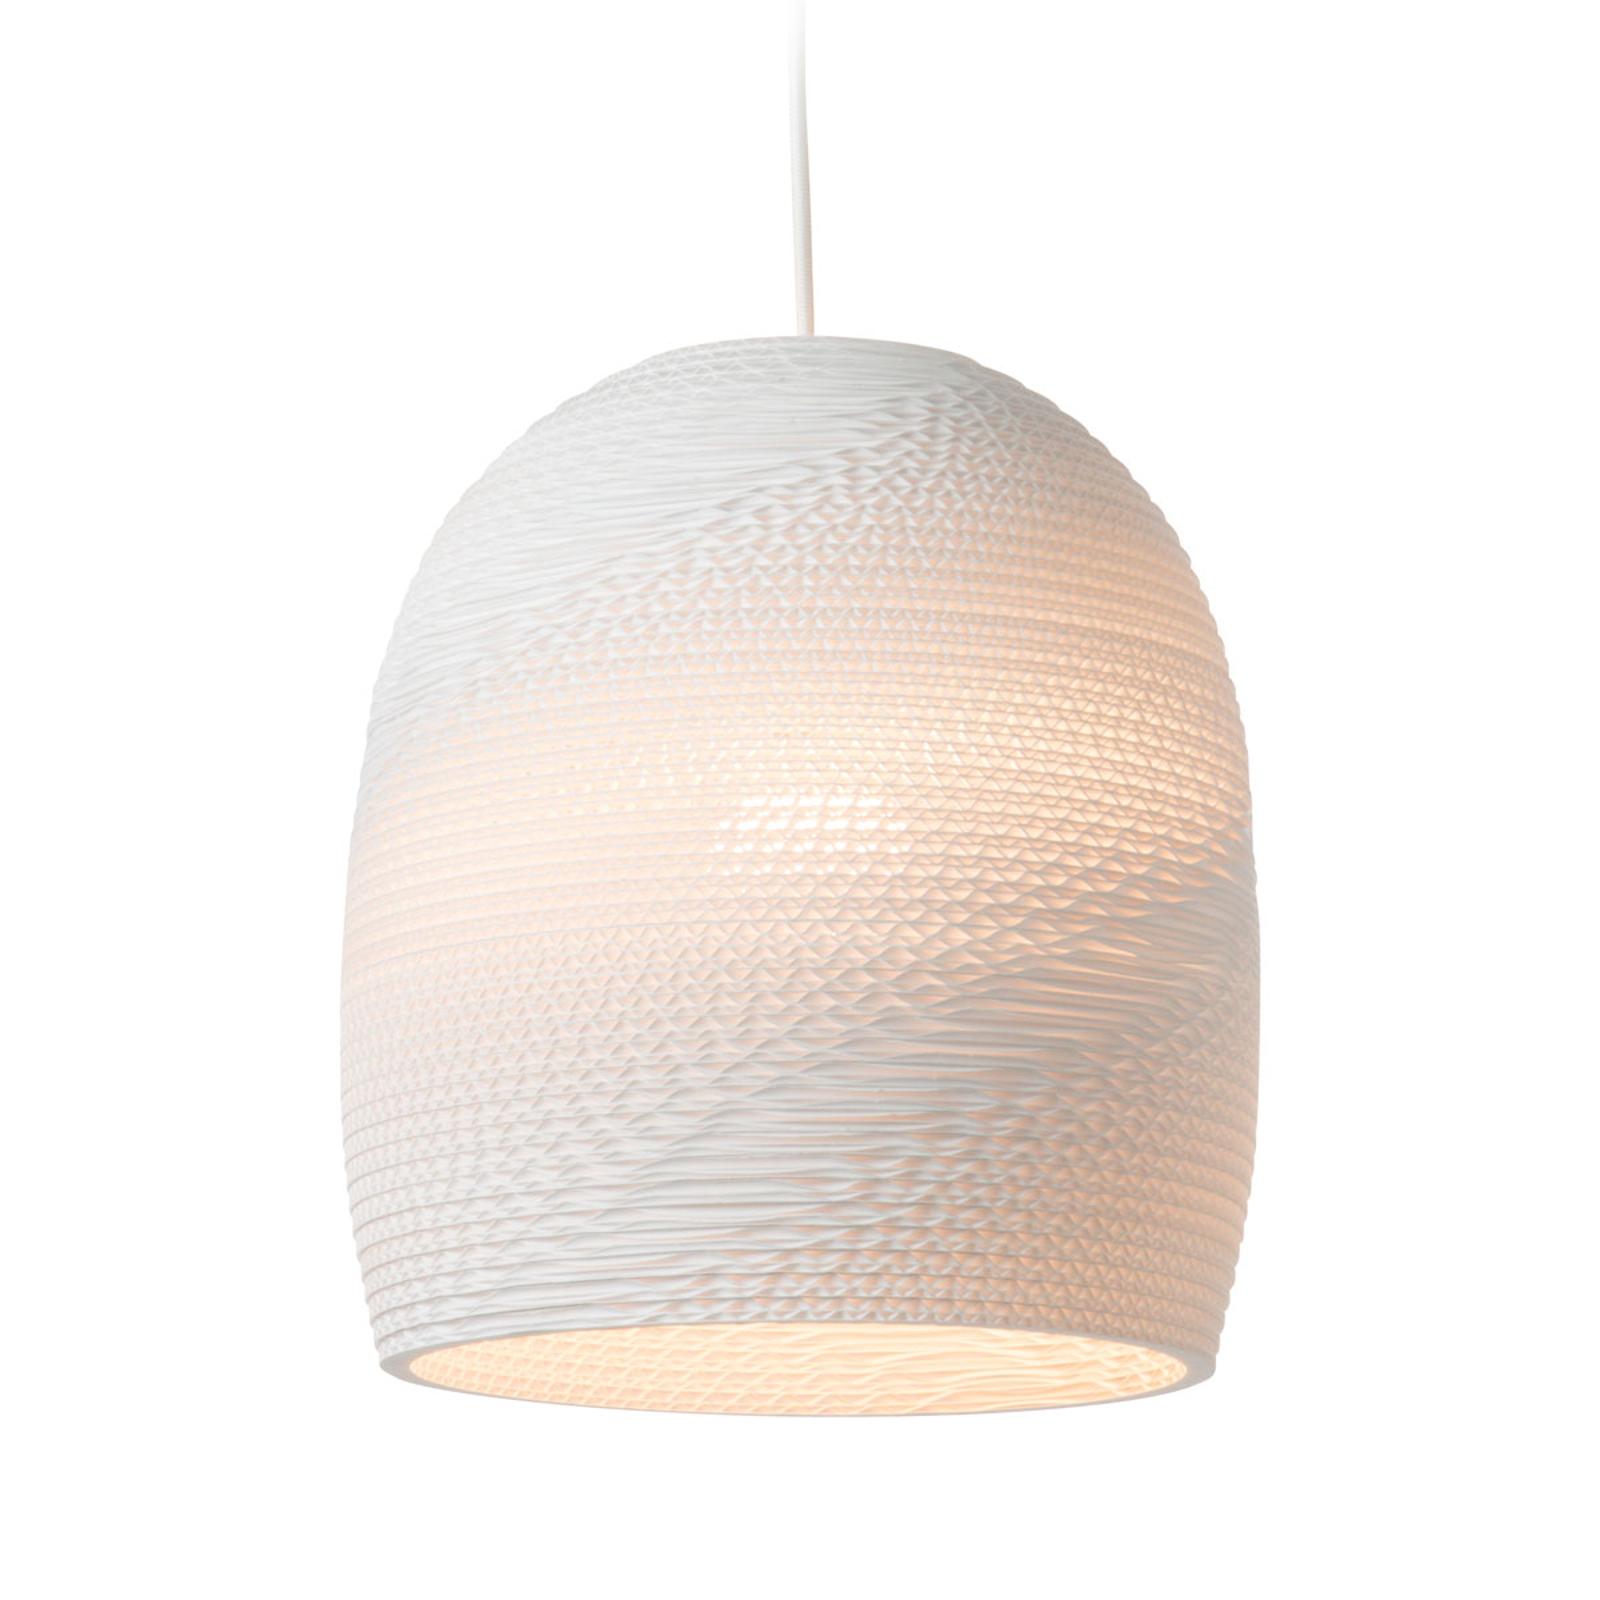 Hanglamp Bell wit Ø 27 cm